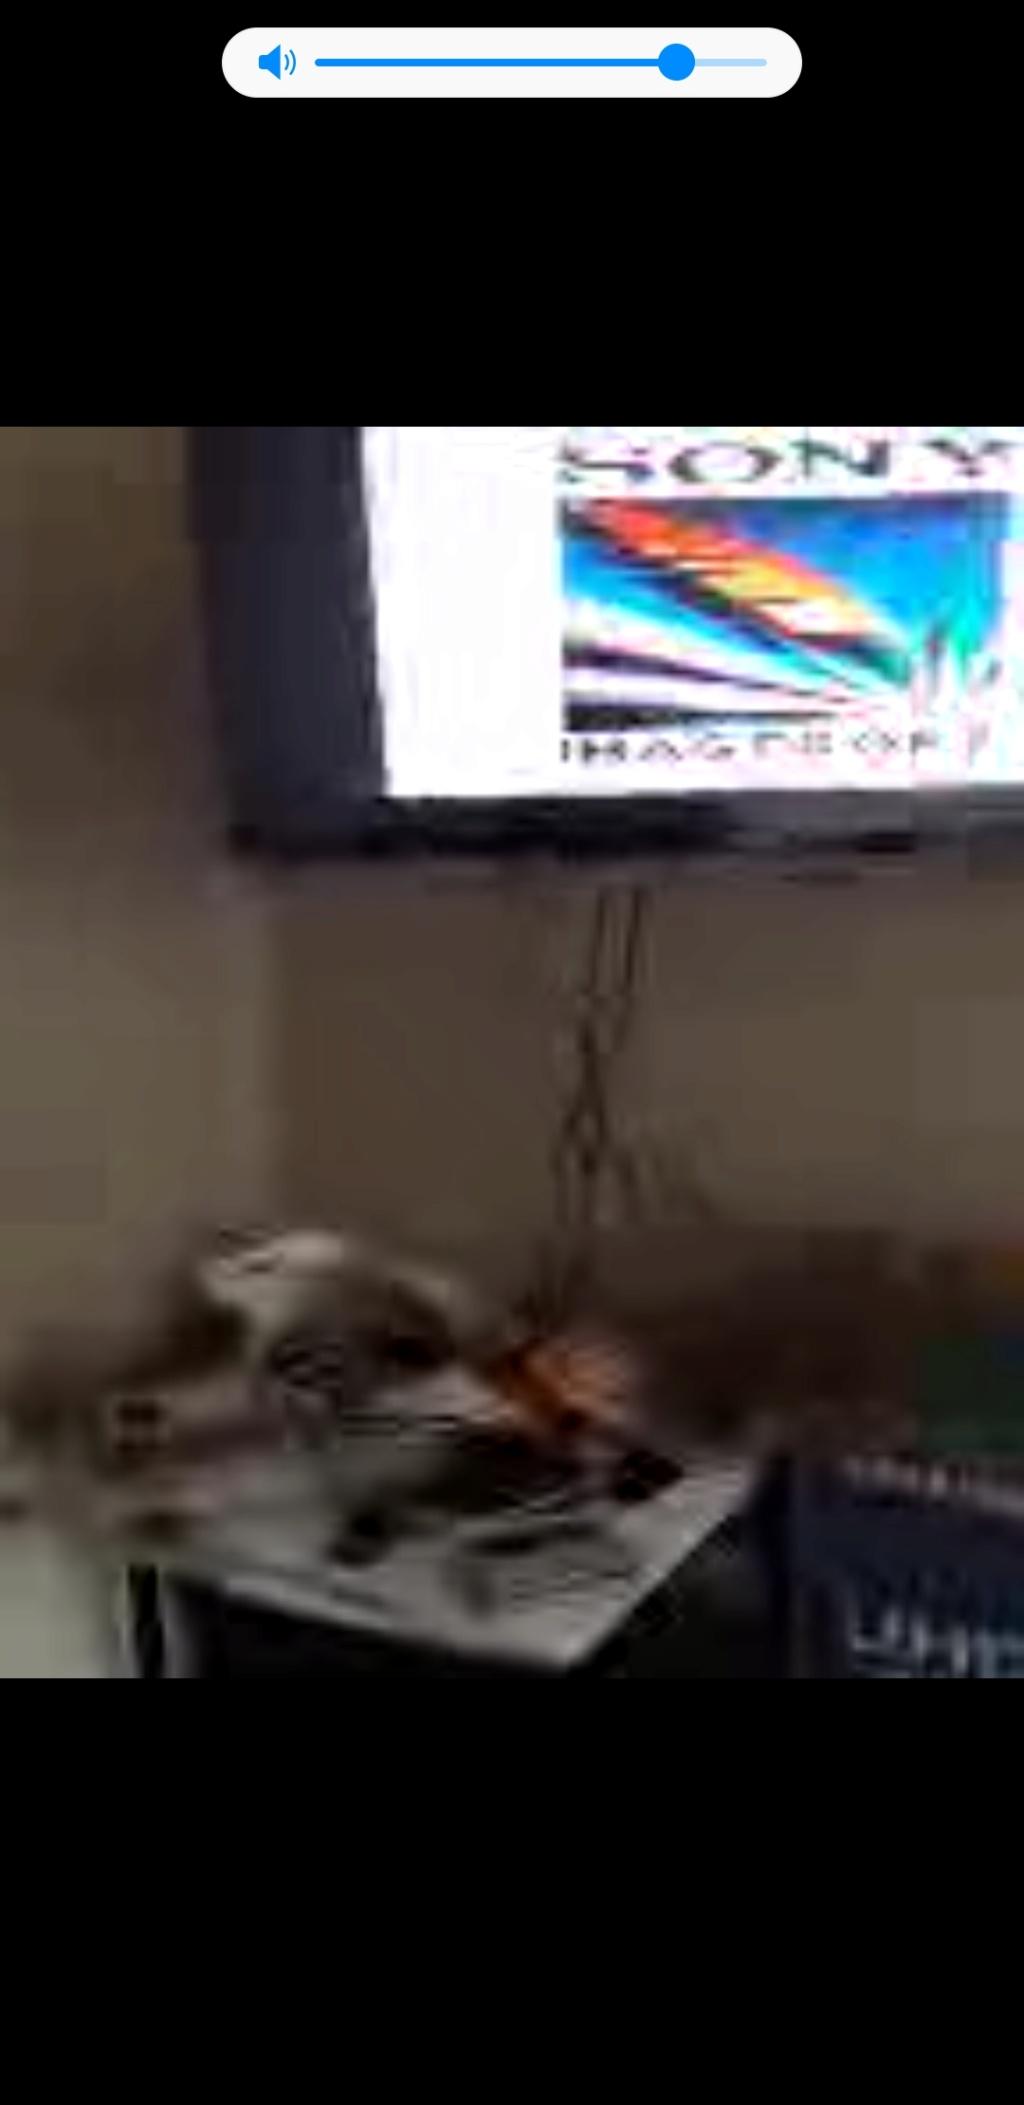 Snes pack street fighter turbo écran noir  Screen11